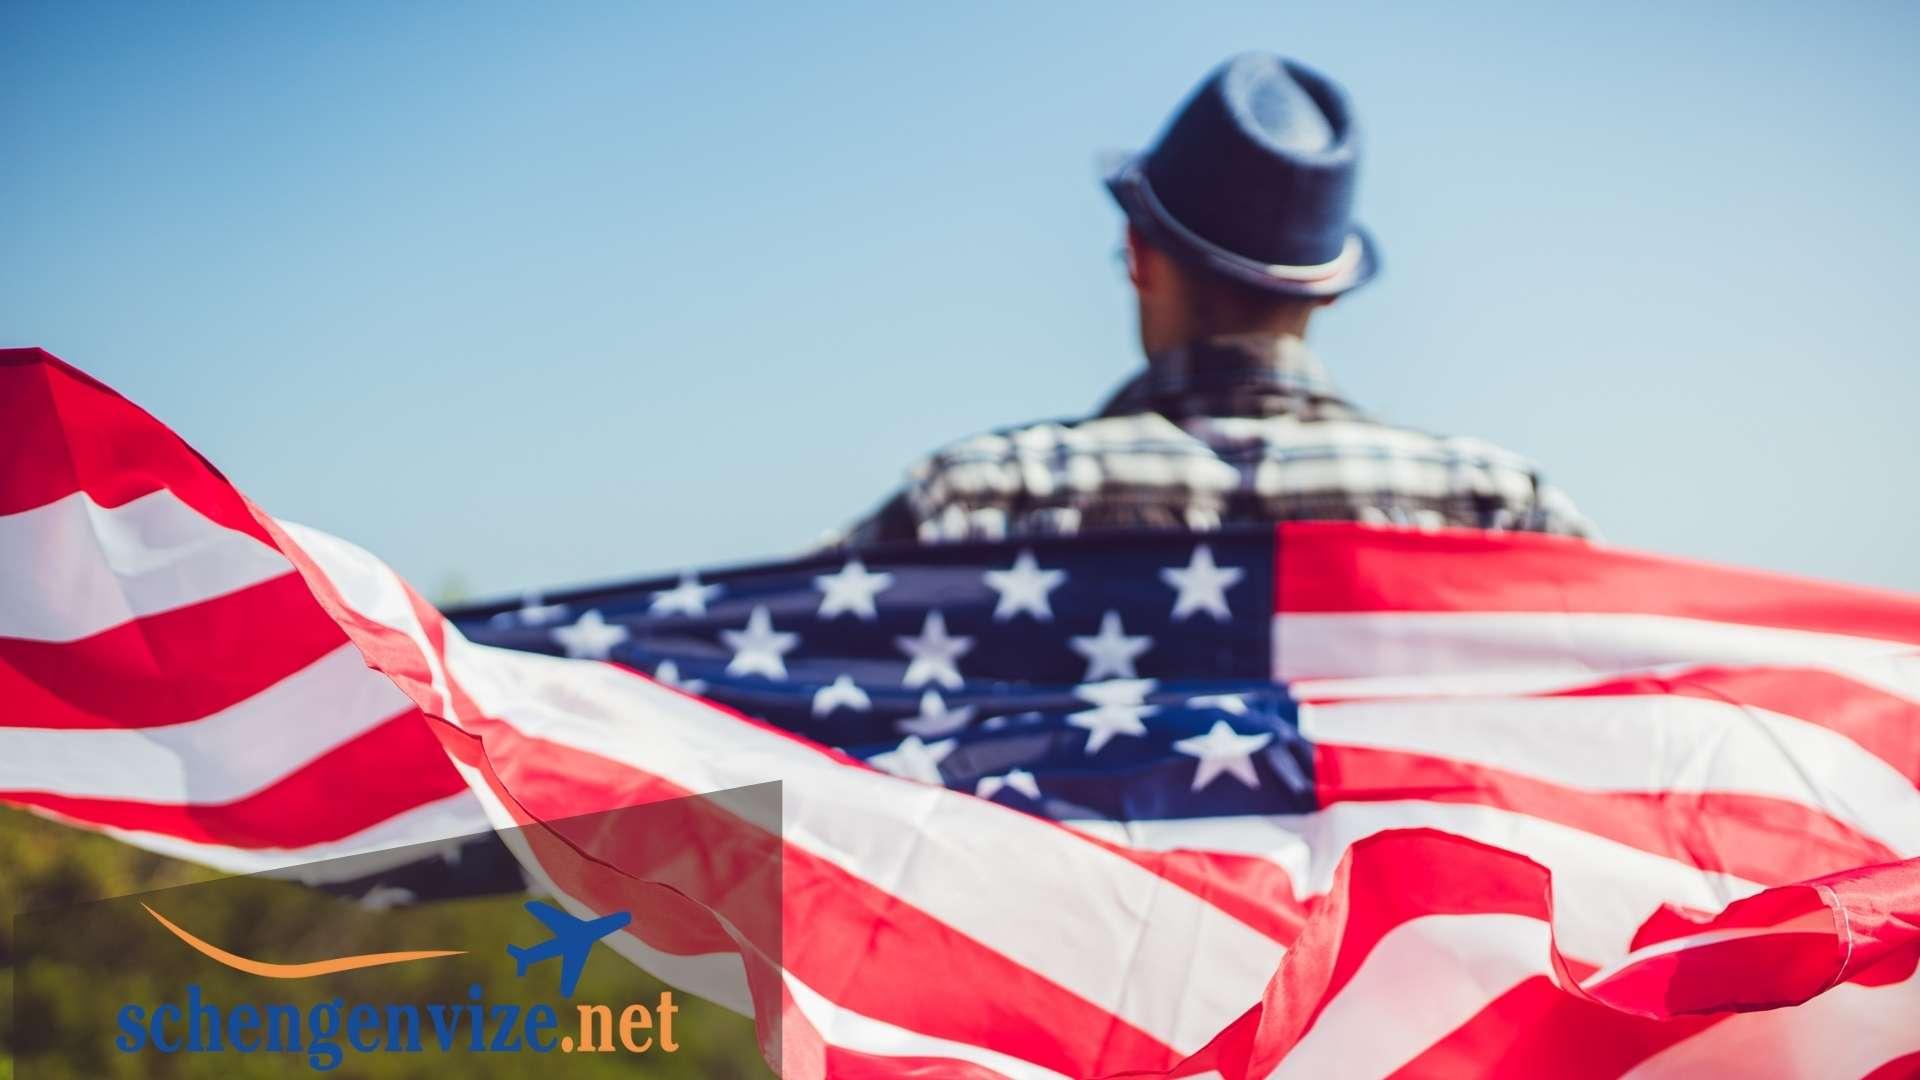 USA Vize Başvuru Formu Nasıl Doldurulur?